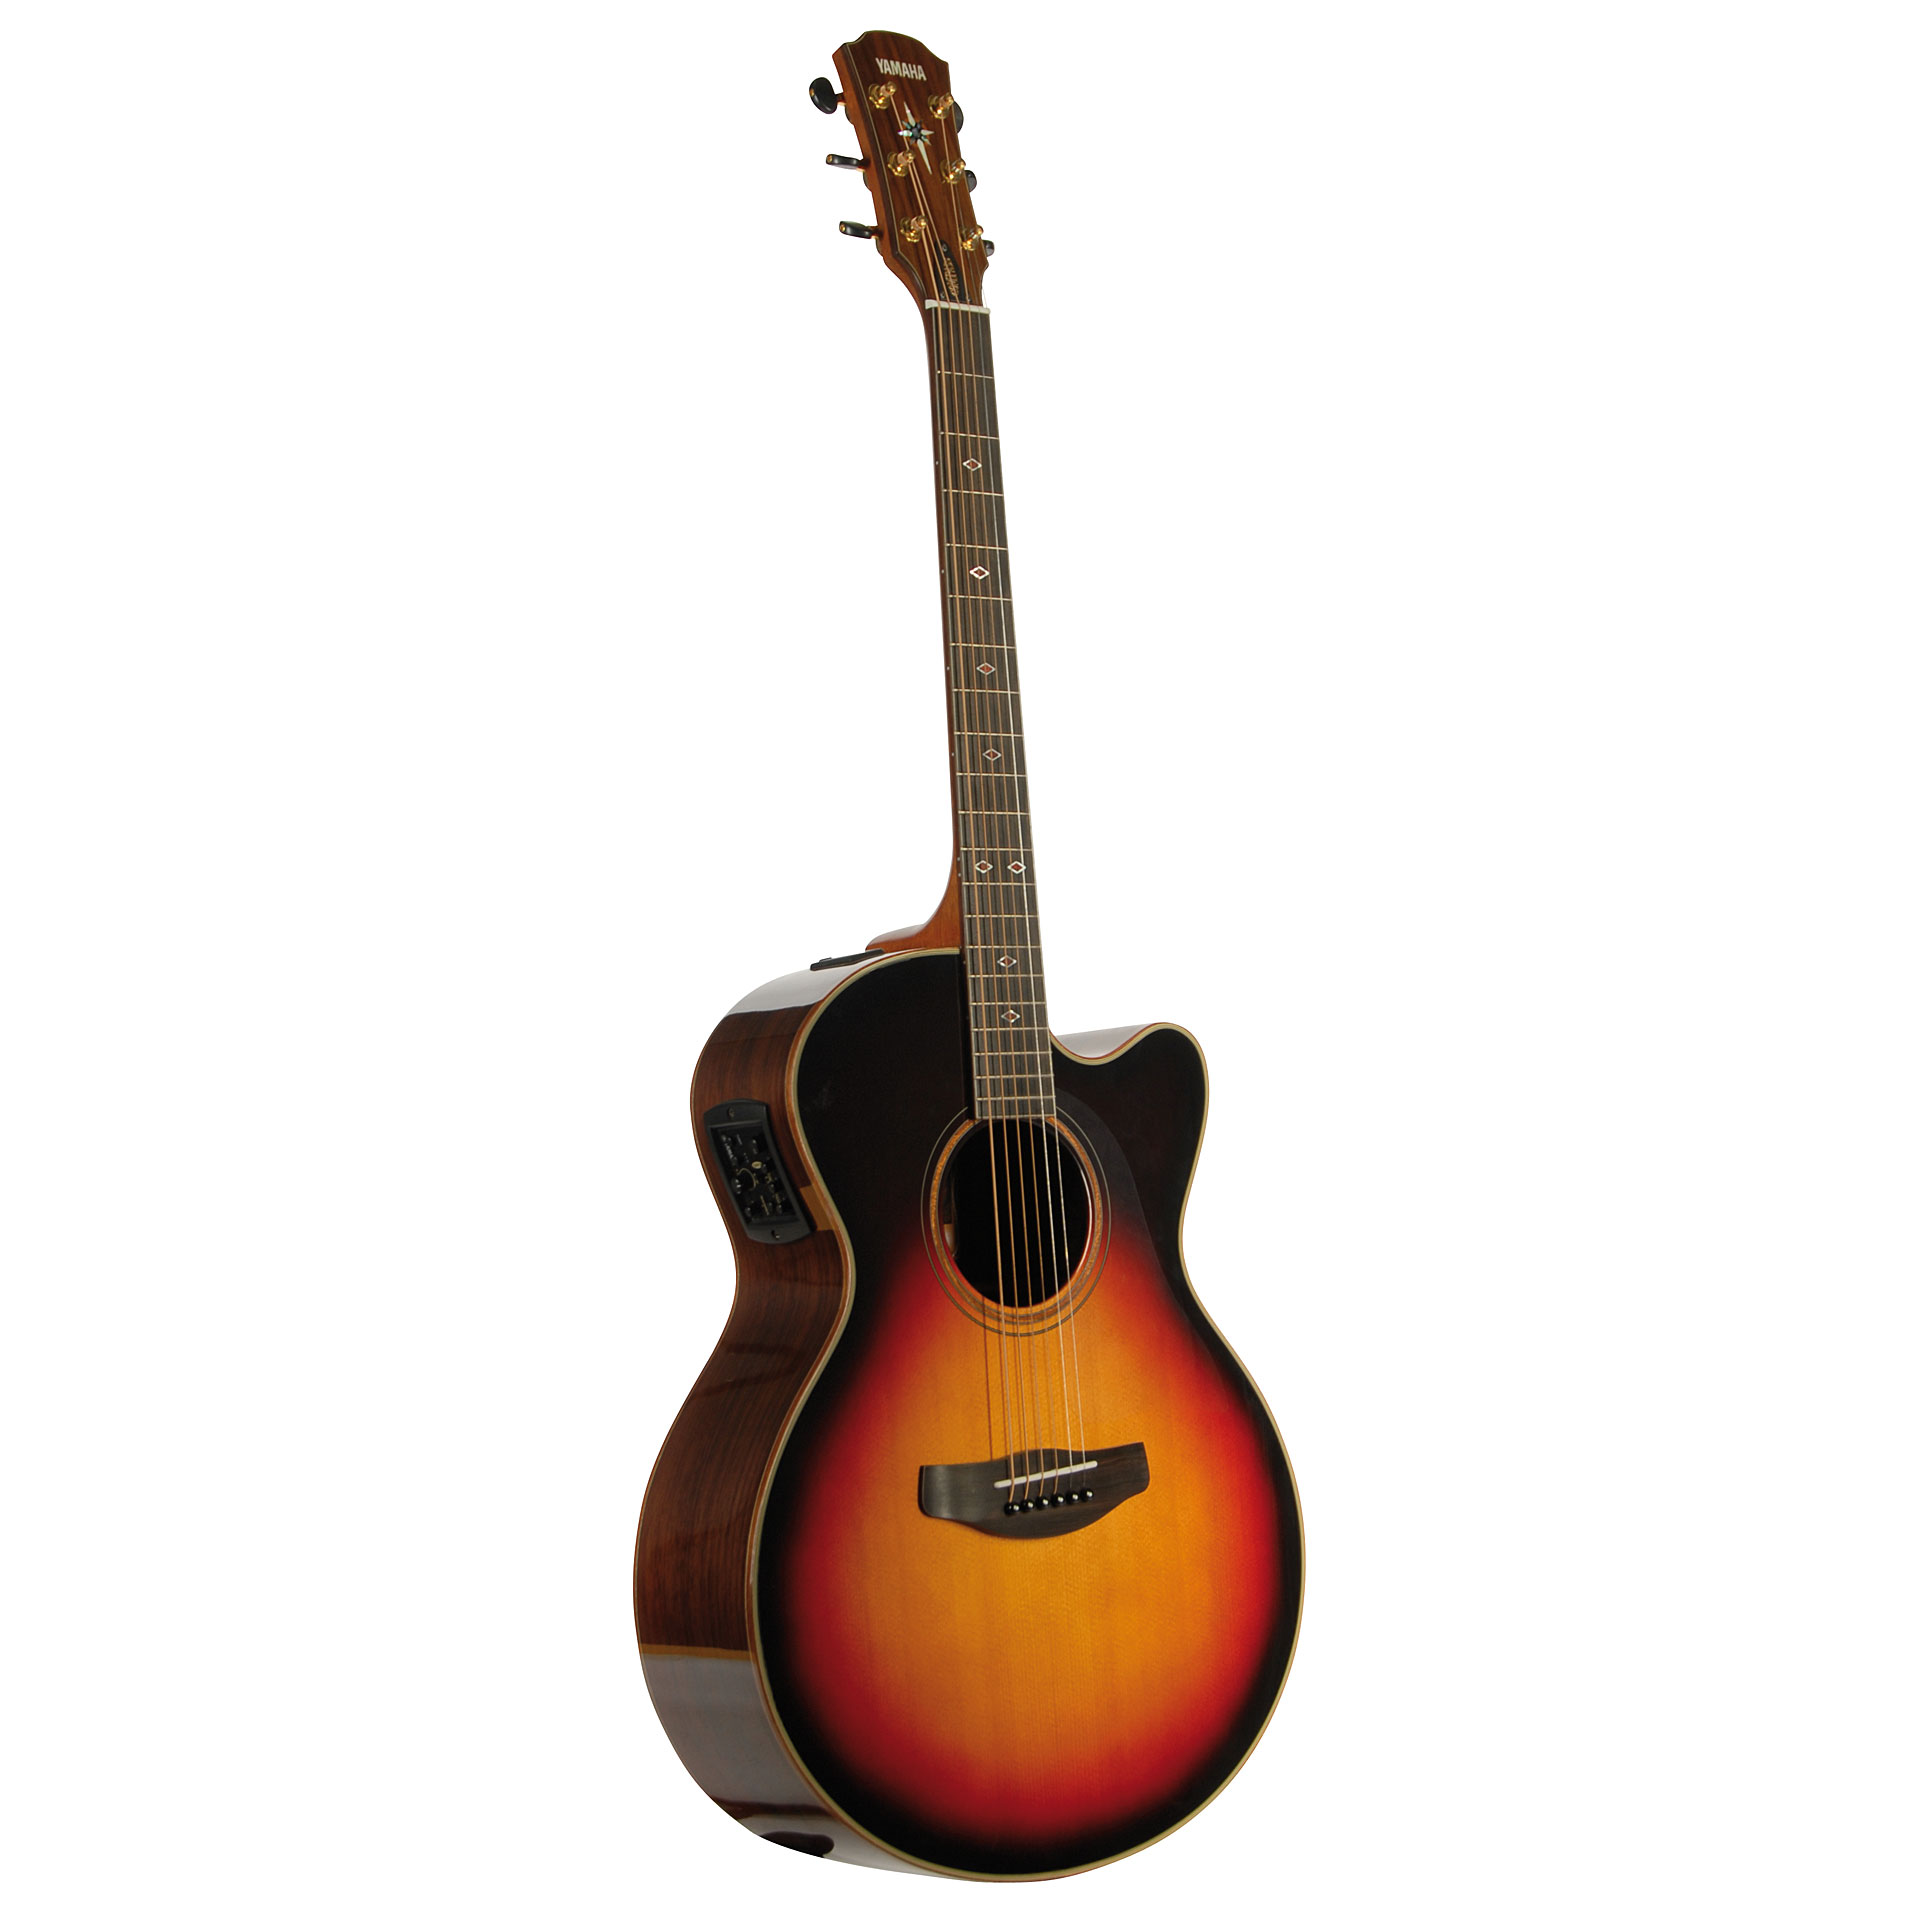 yamaha cpx1200ii vs guitare acoustique. Black Bedroom Furniture Sets. Home Design Ideas